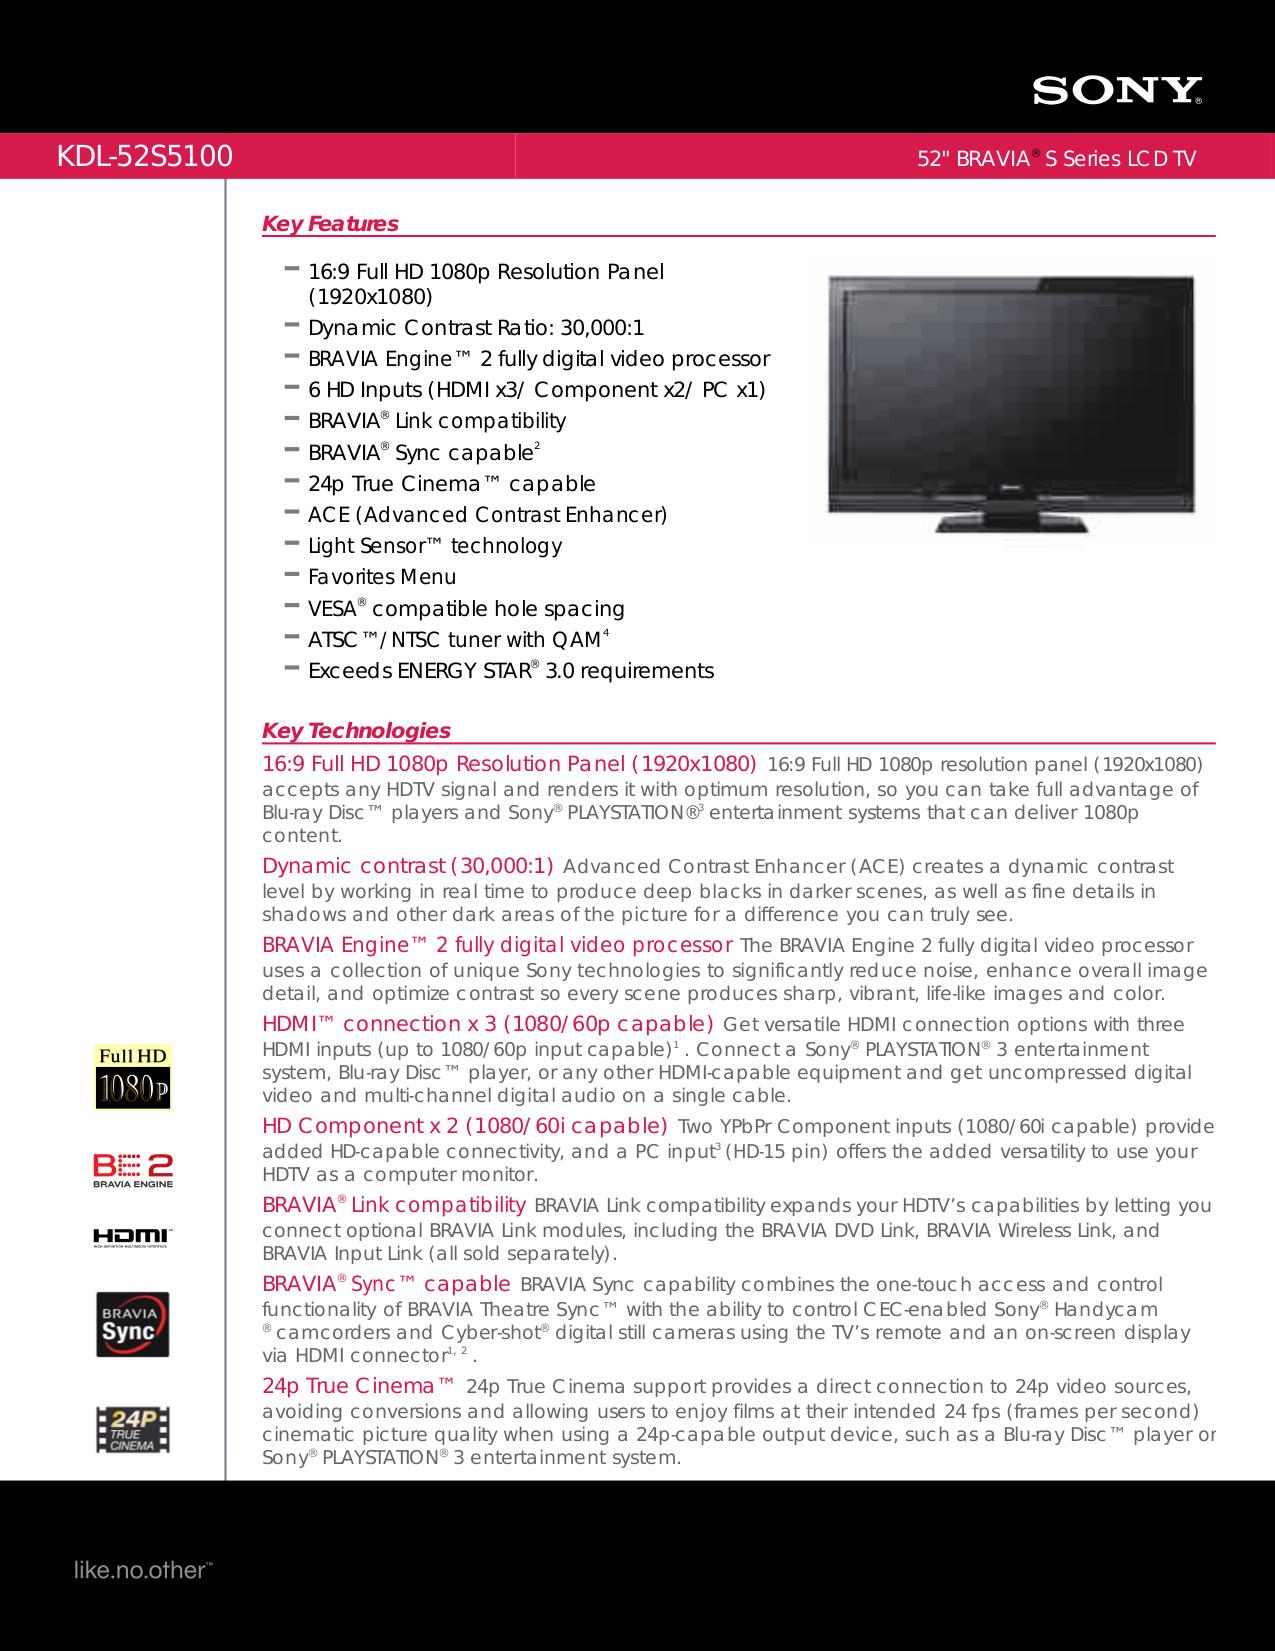 Sony bravia kdl-52s5100 manuals.